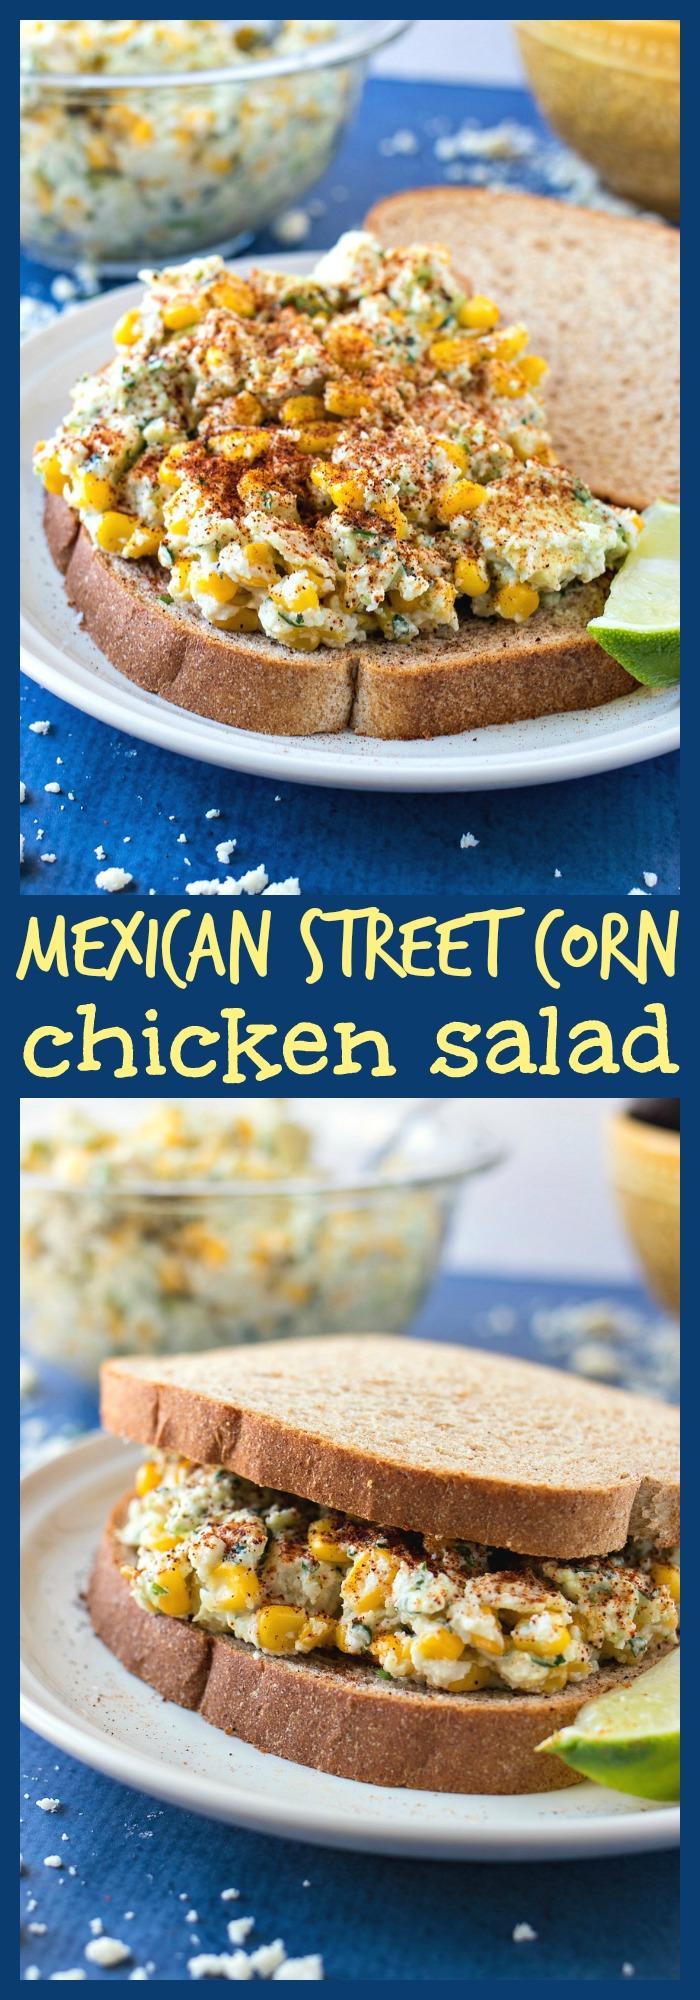 Mexican Street Corn Chicken Salad photo collage